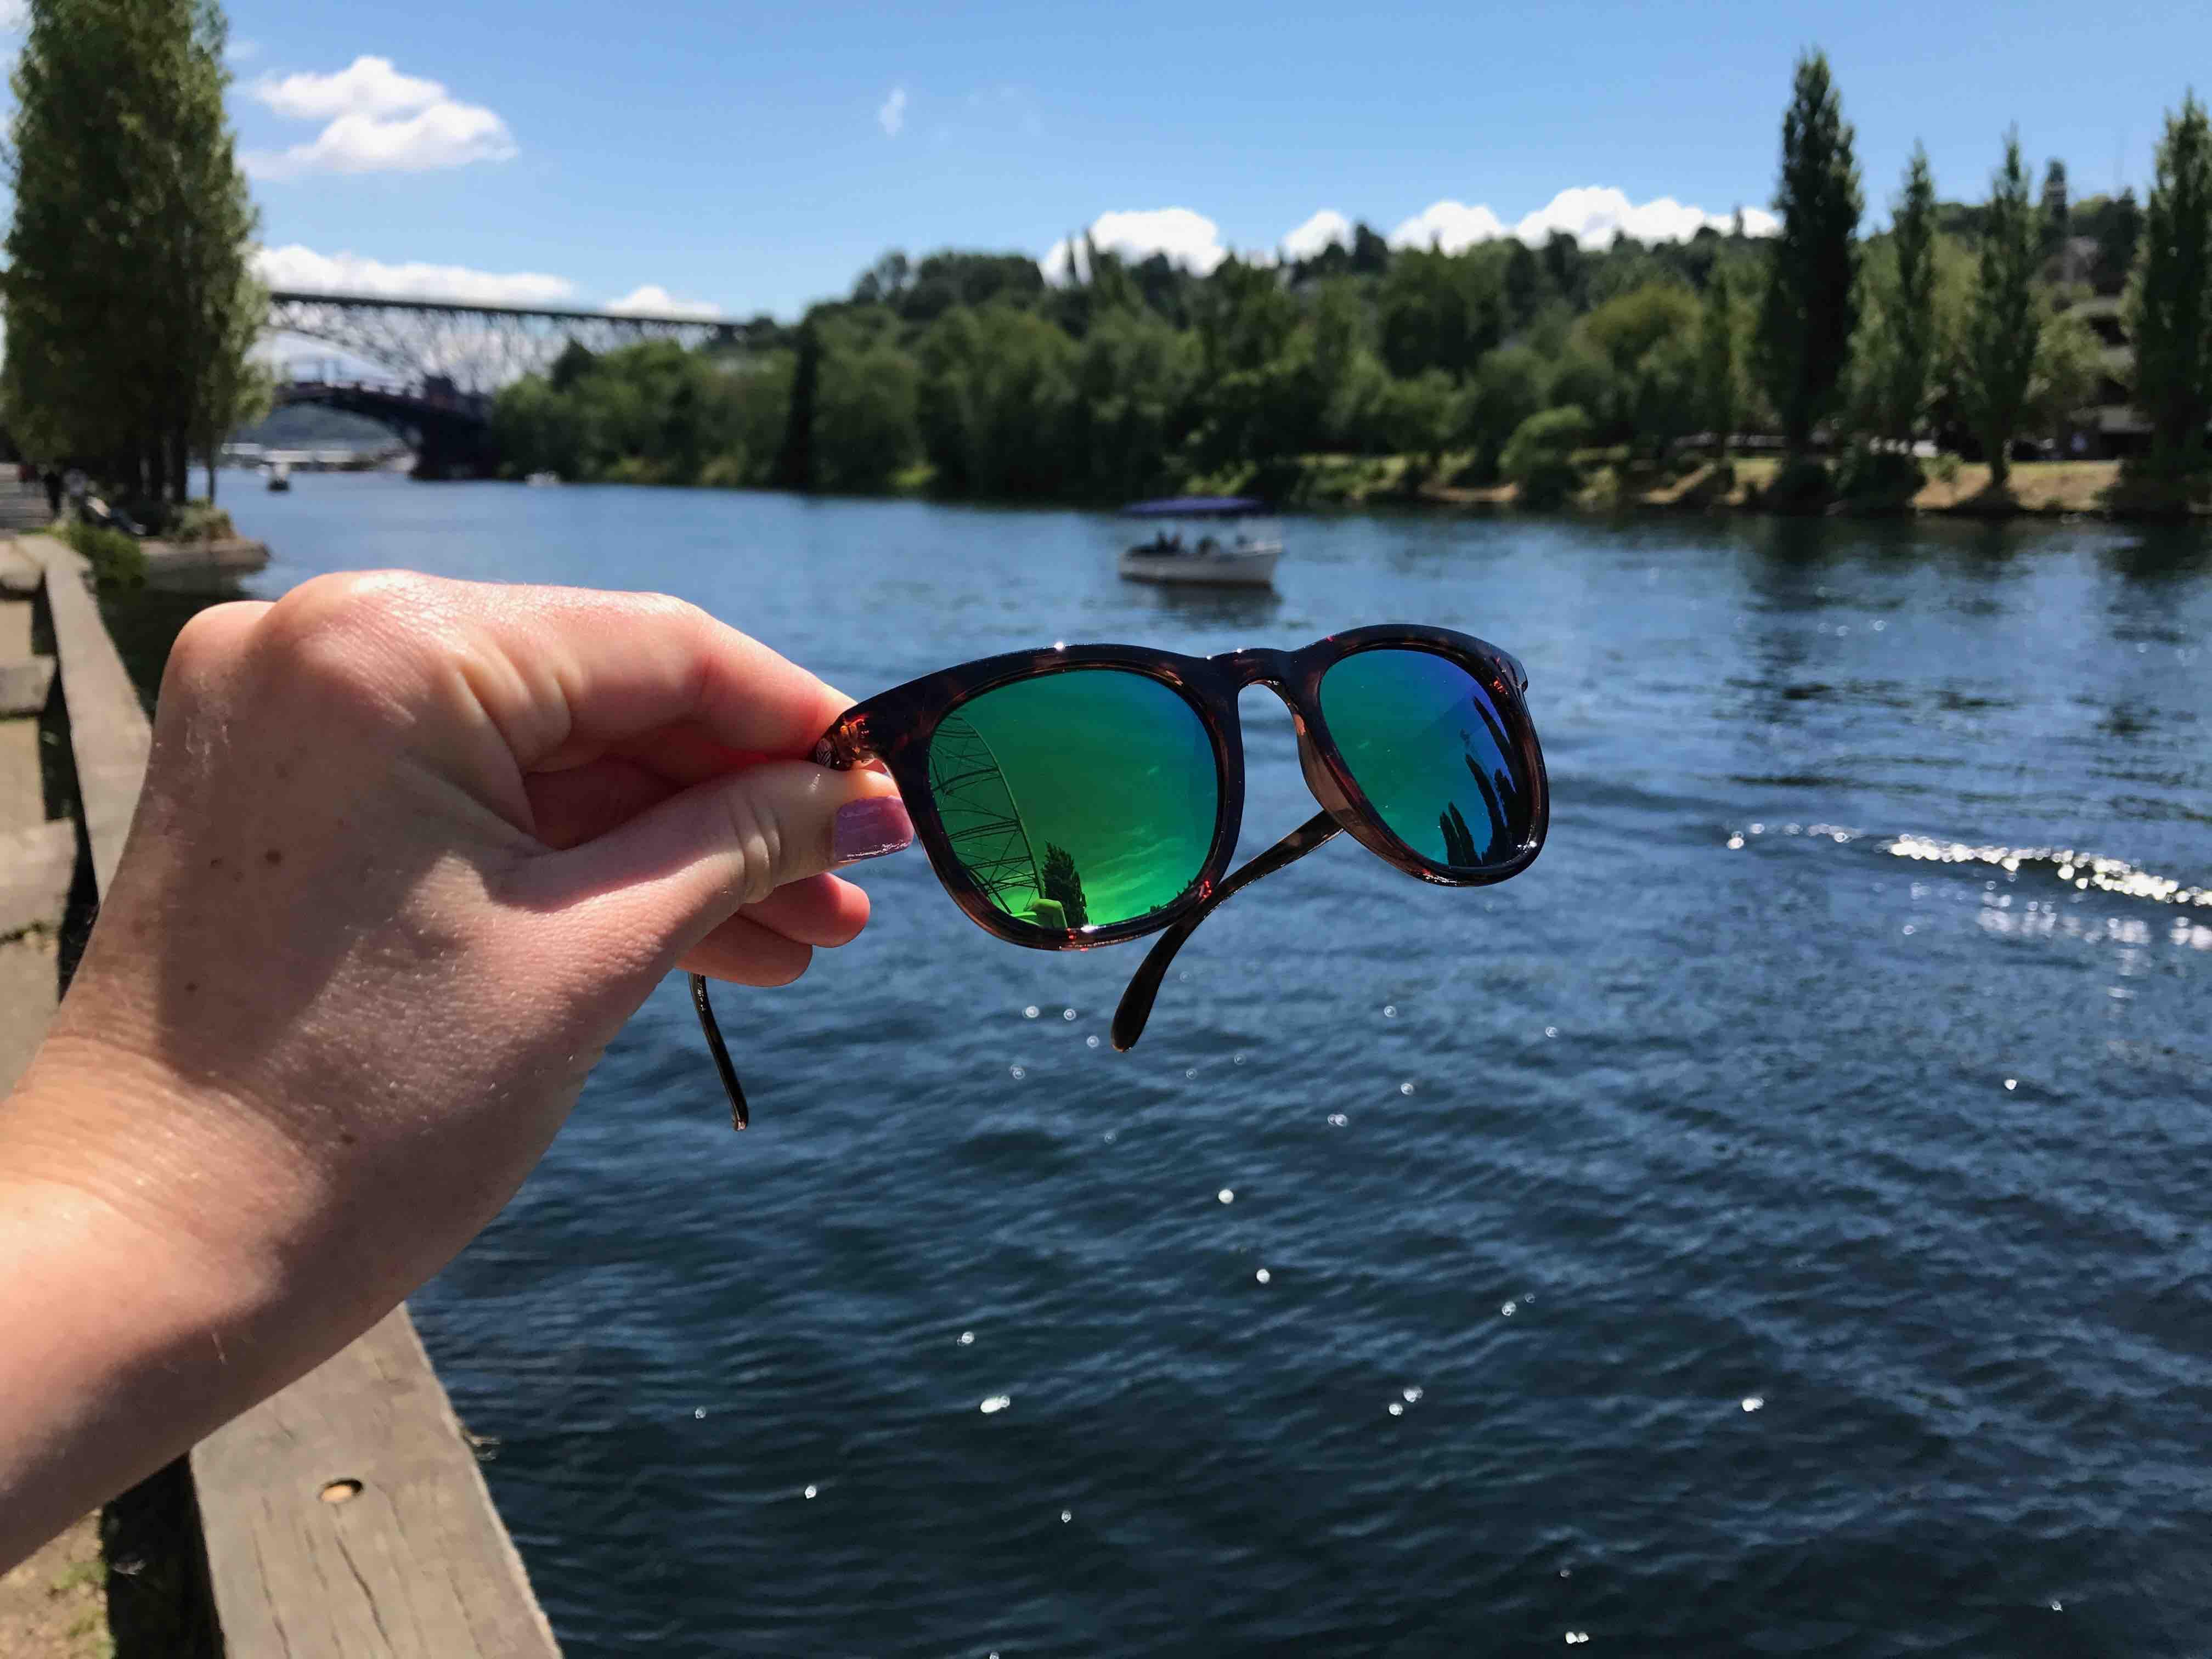 cf914fef05 Sunski Sunglasses Review